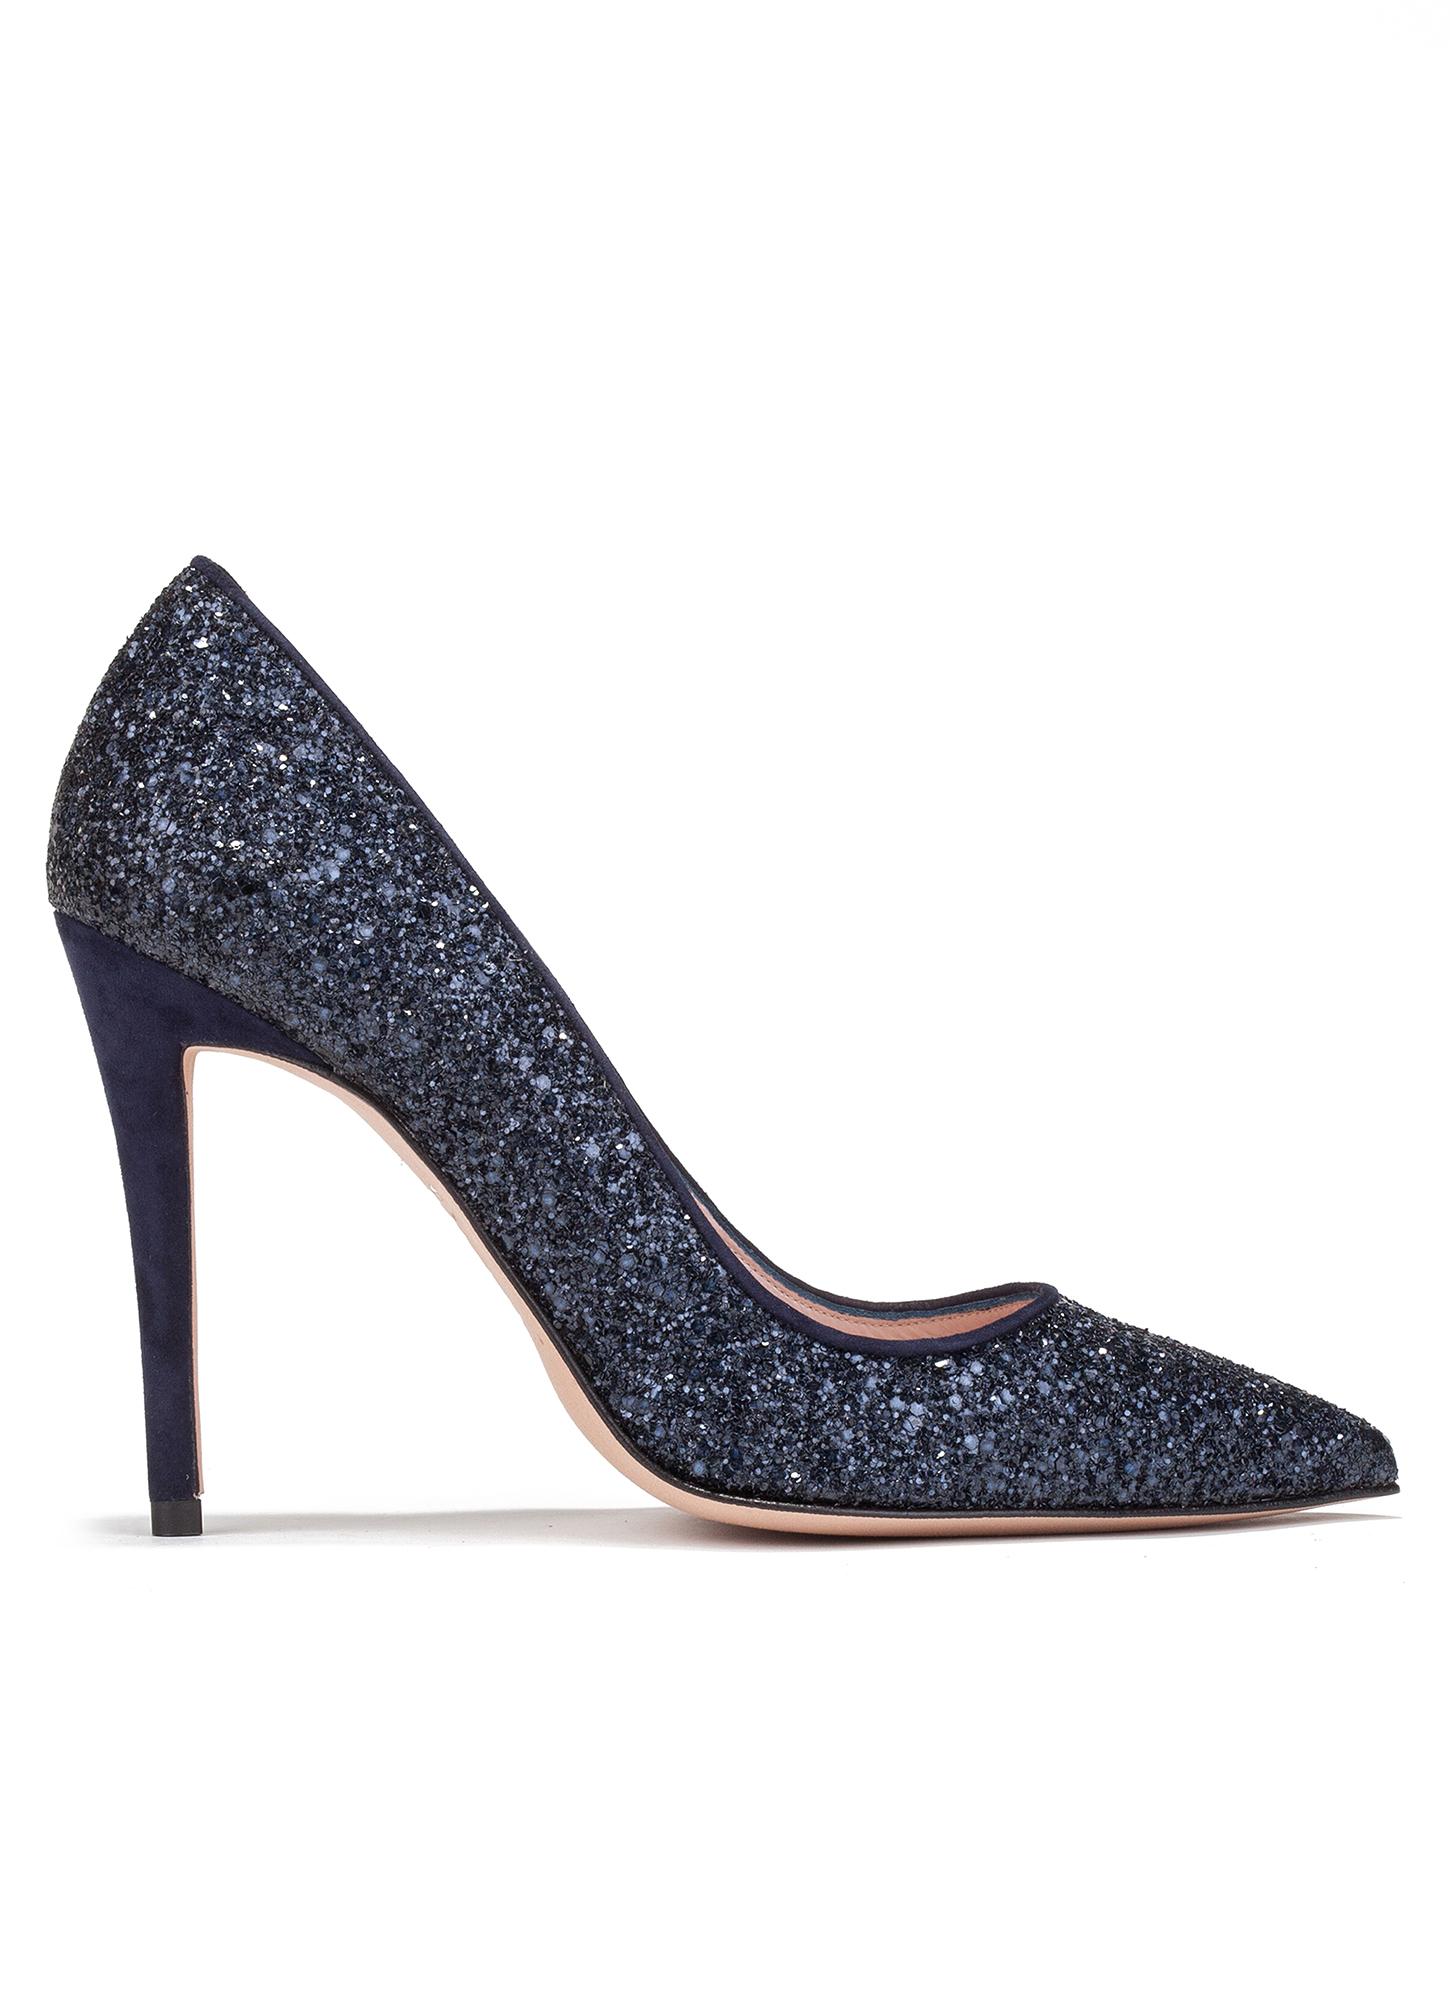 High heel pumps in navy blue glitter - online shoe store Pura ...